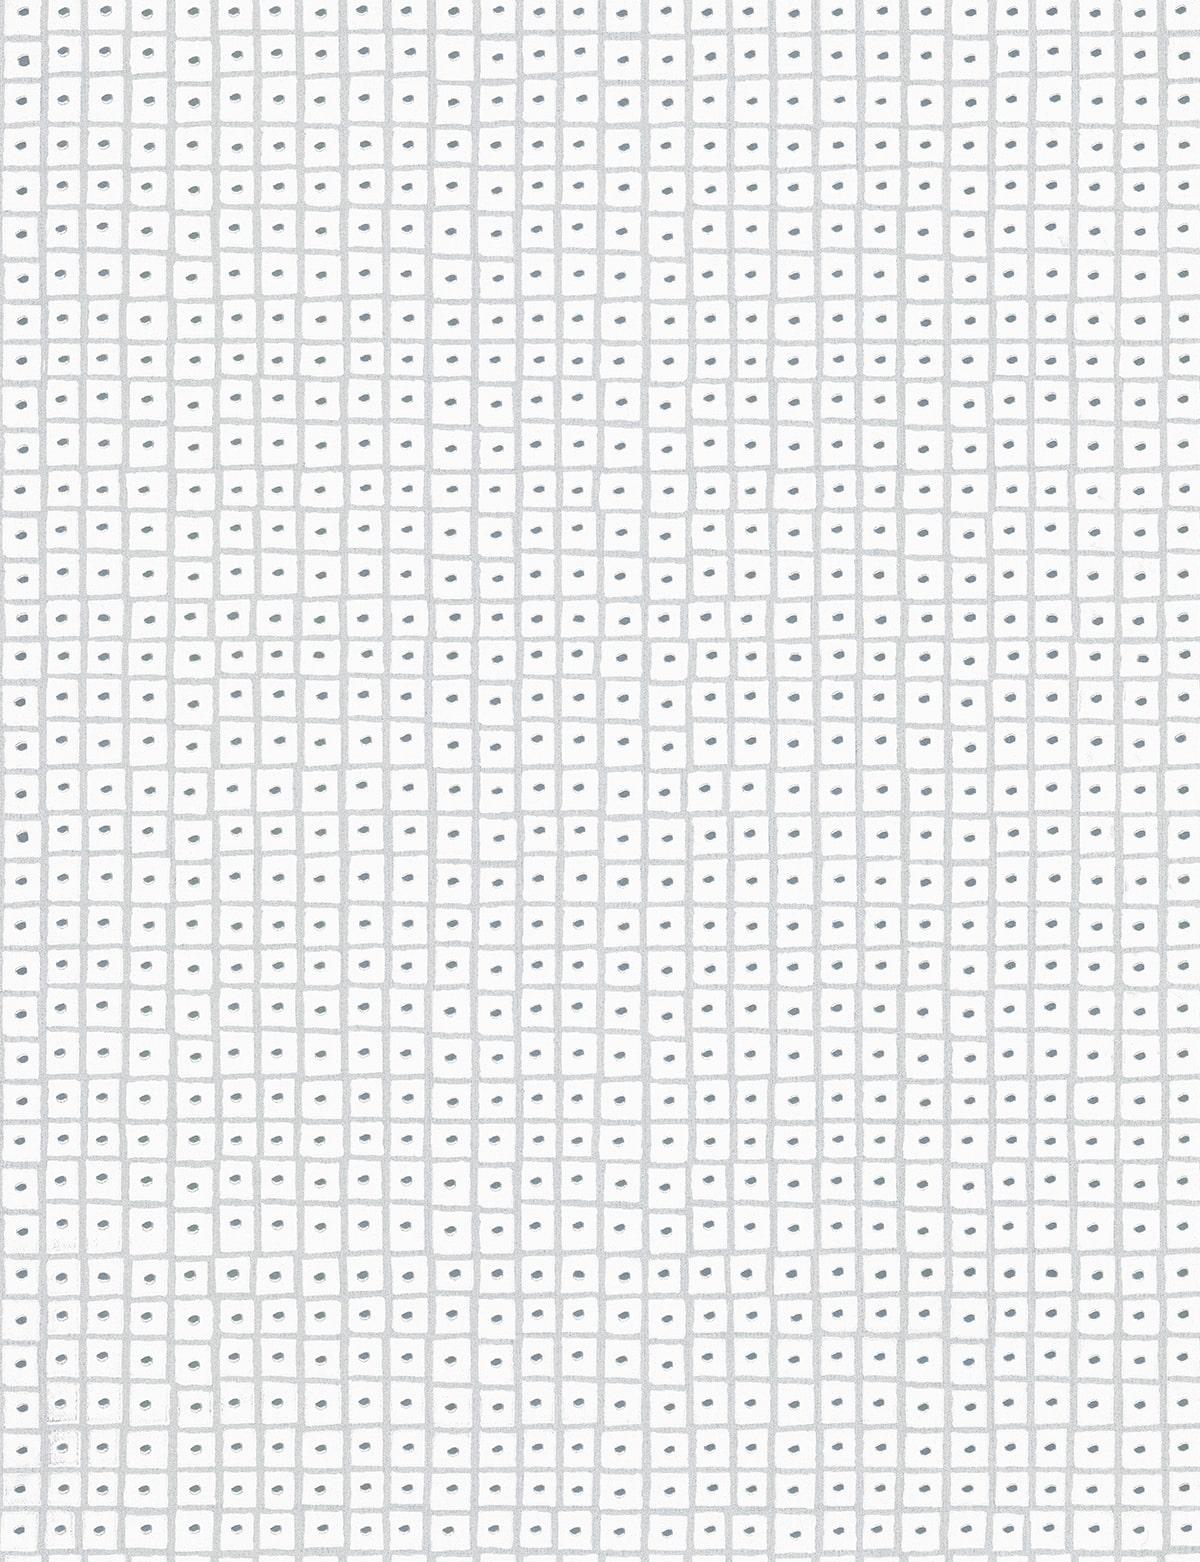 Tribal Mountain - Collezione 2 - Unconventional Wallpaper